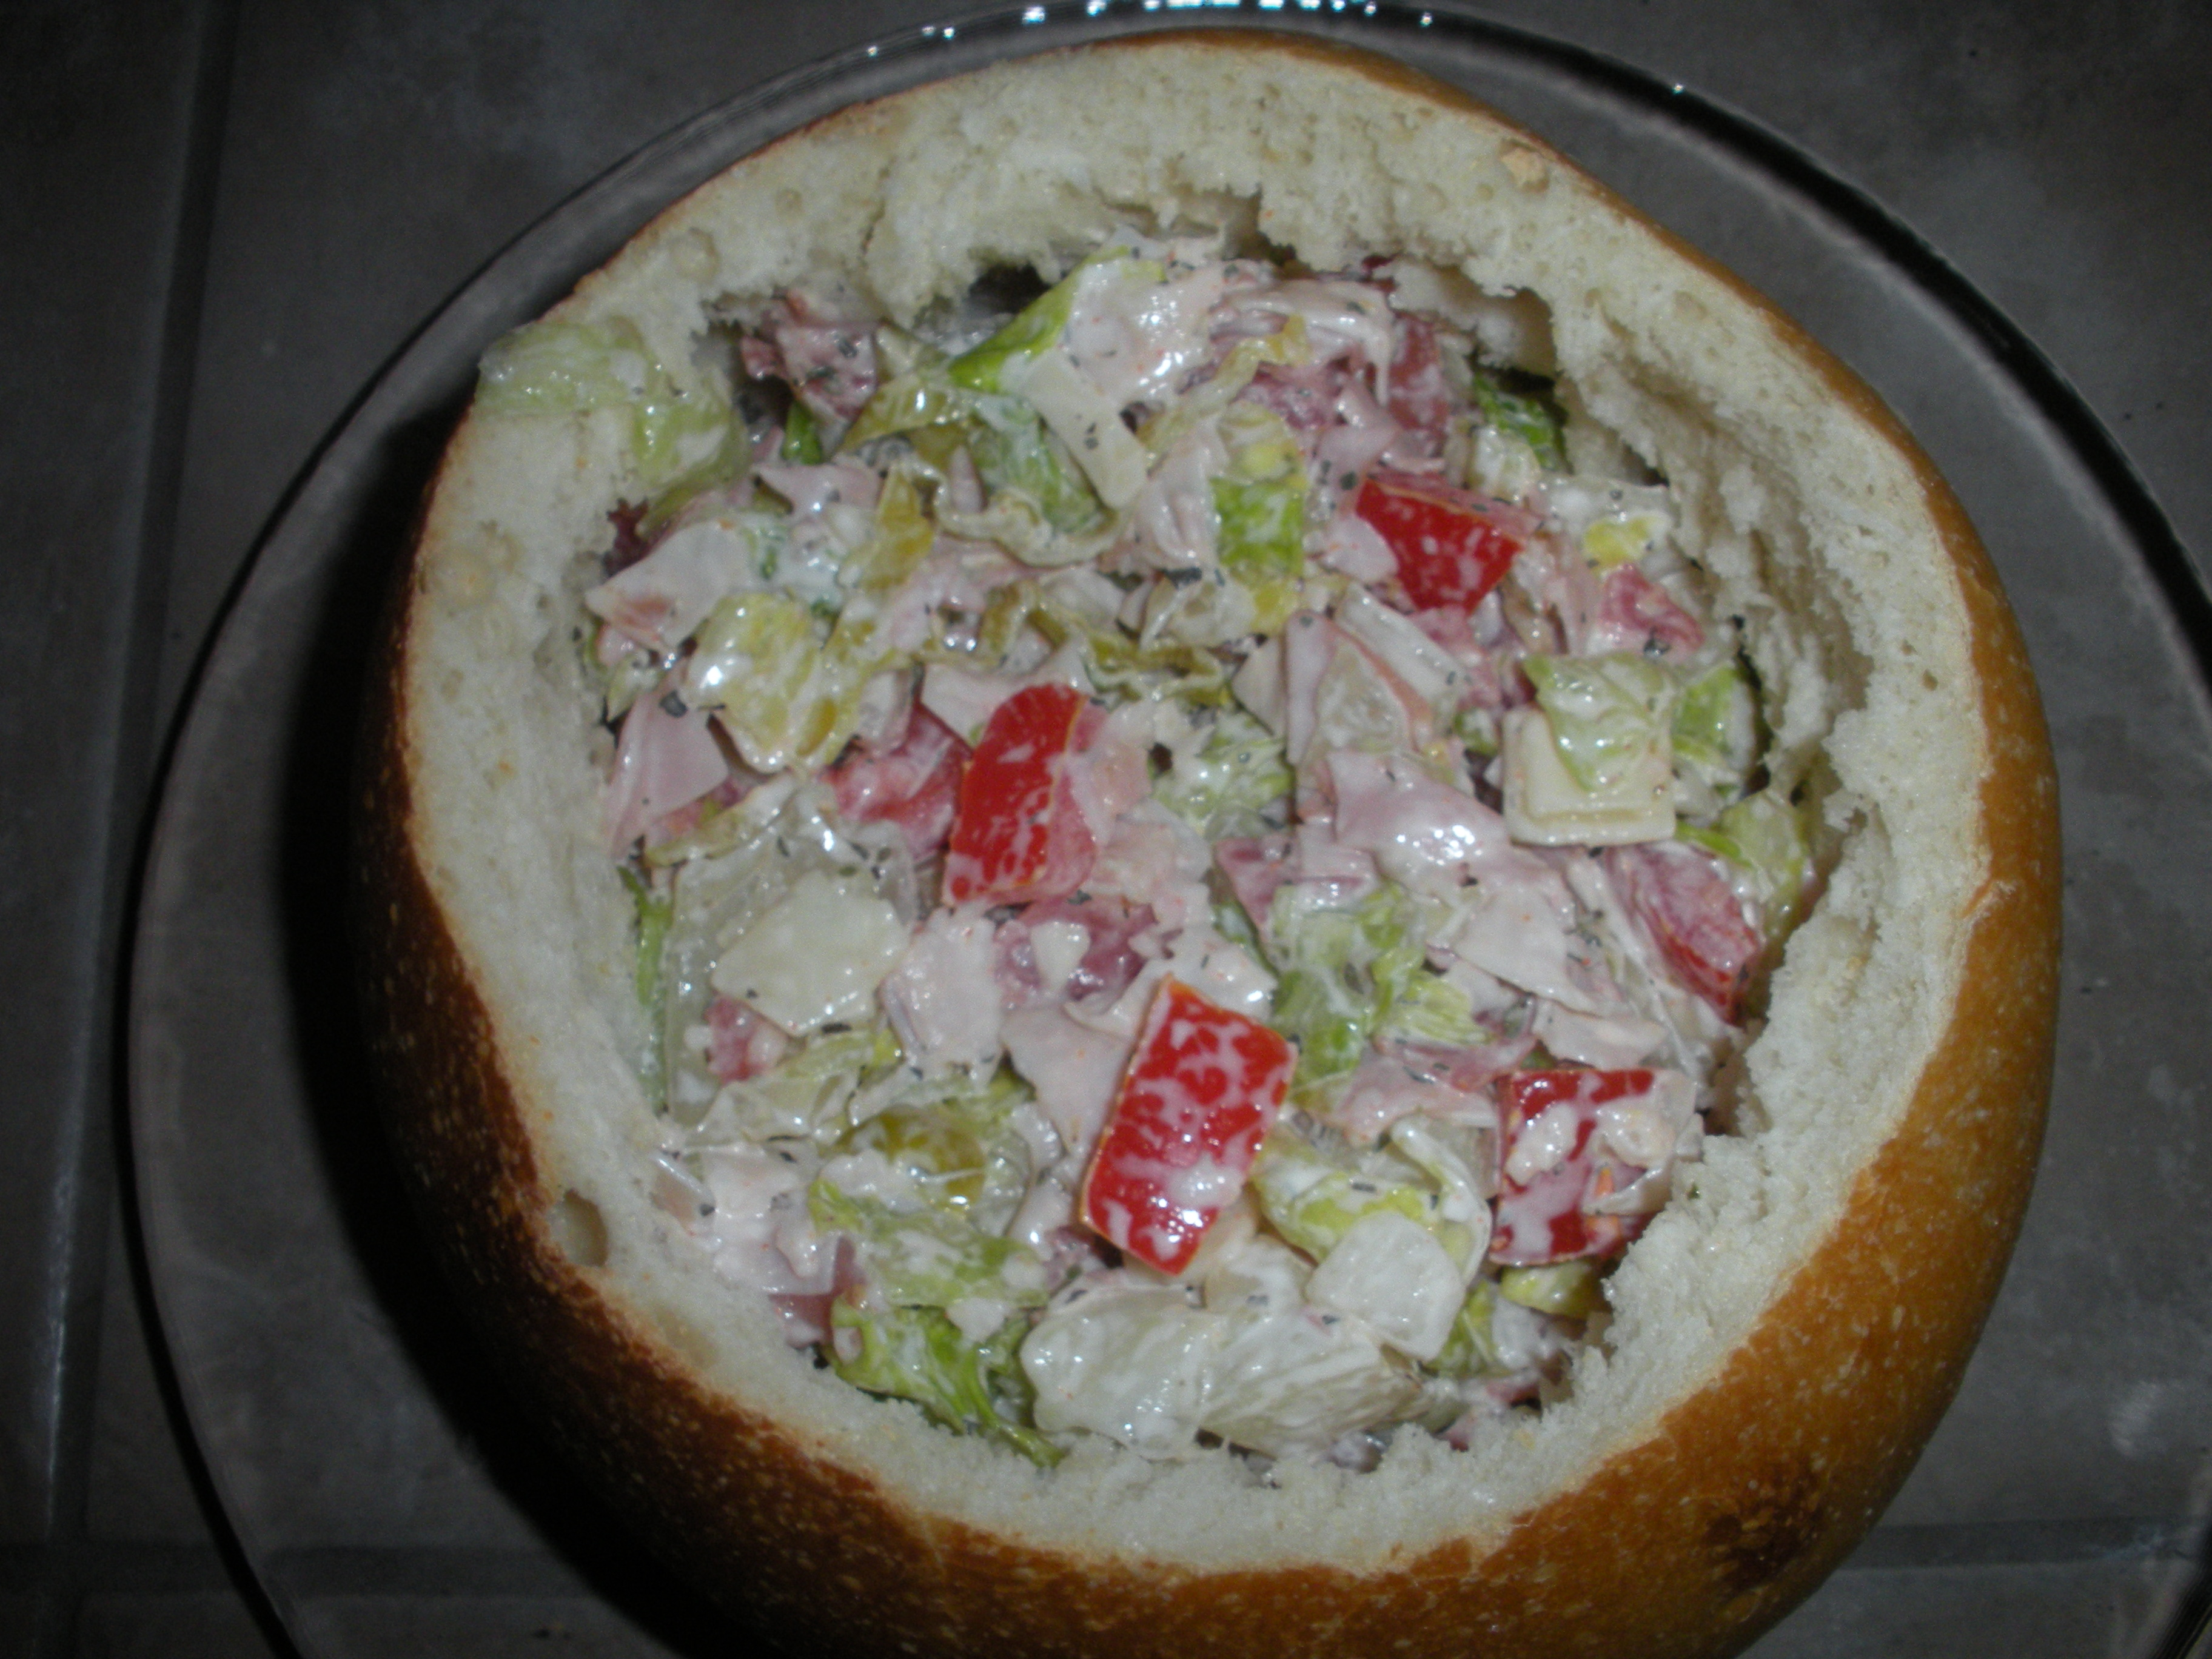 Super bowl appetizer recipes and snacks genius kitchen forumfinder Images